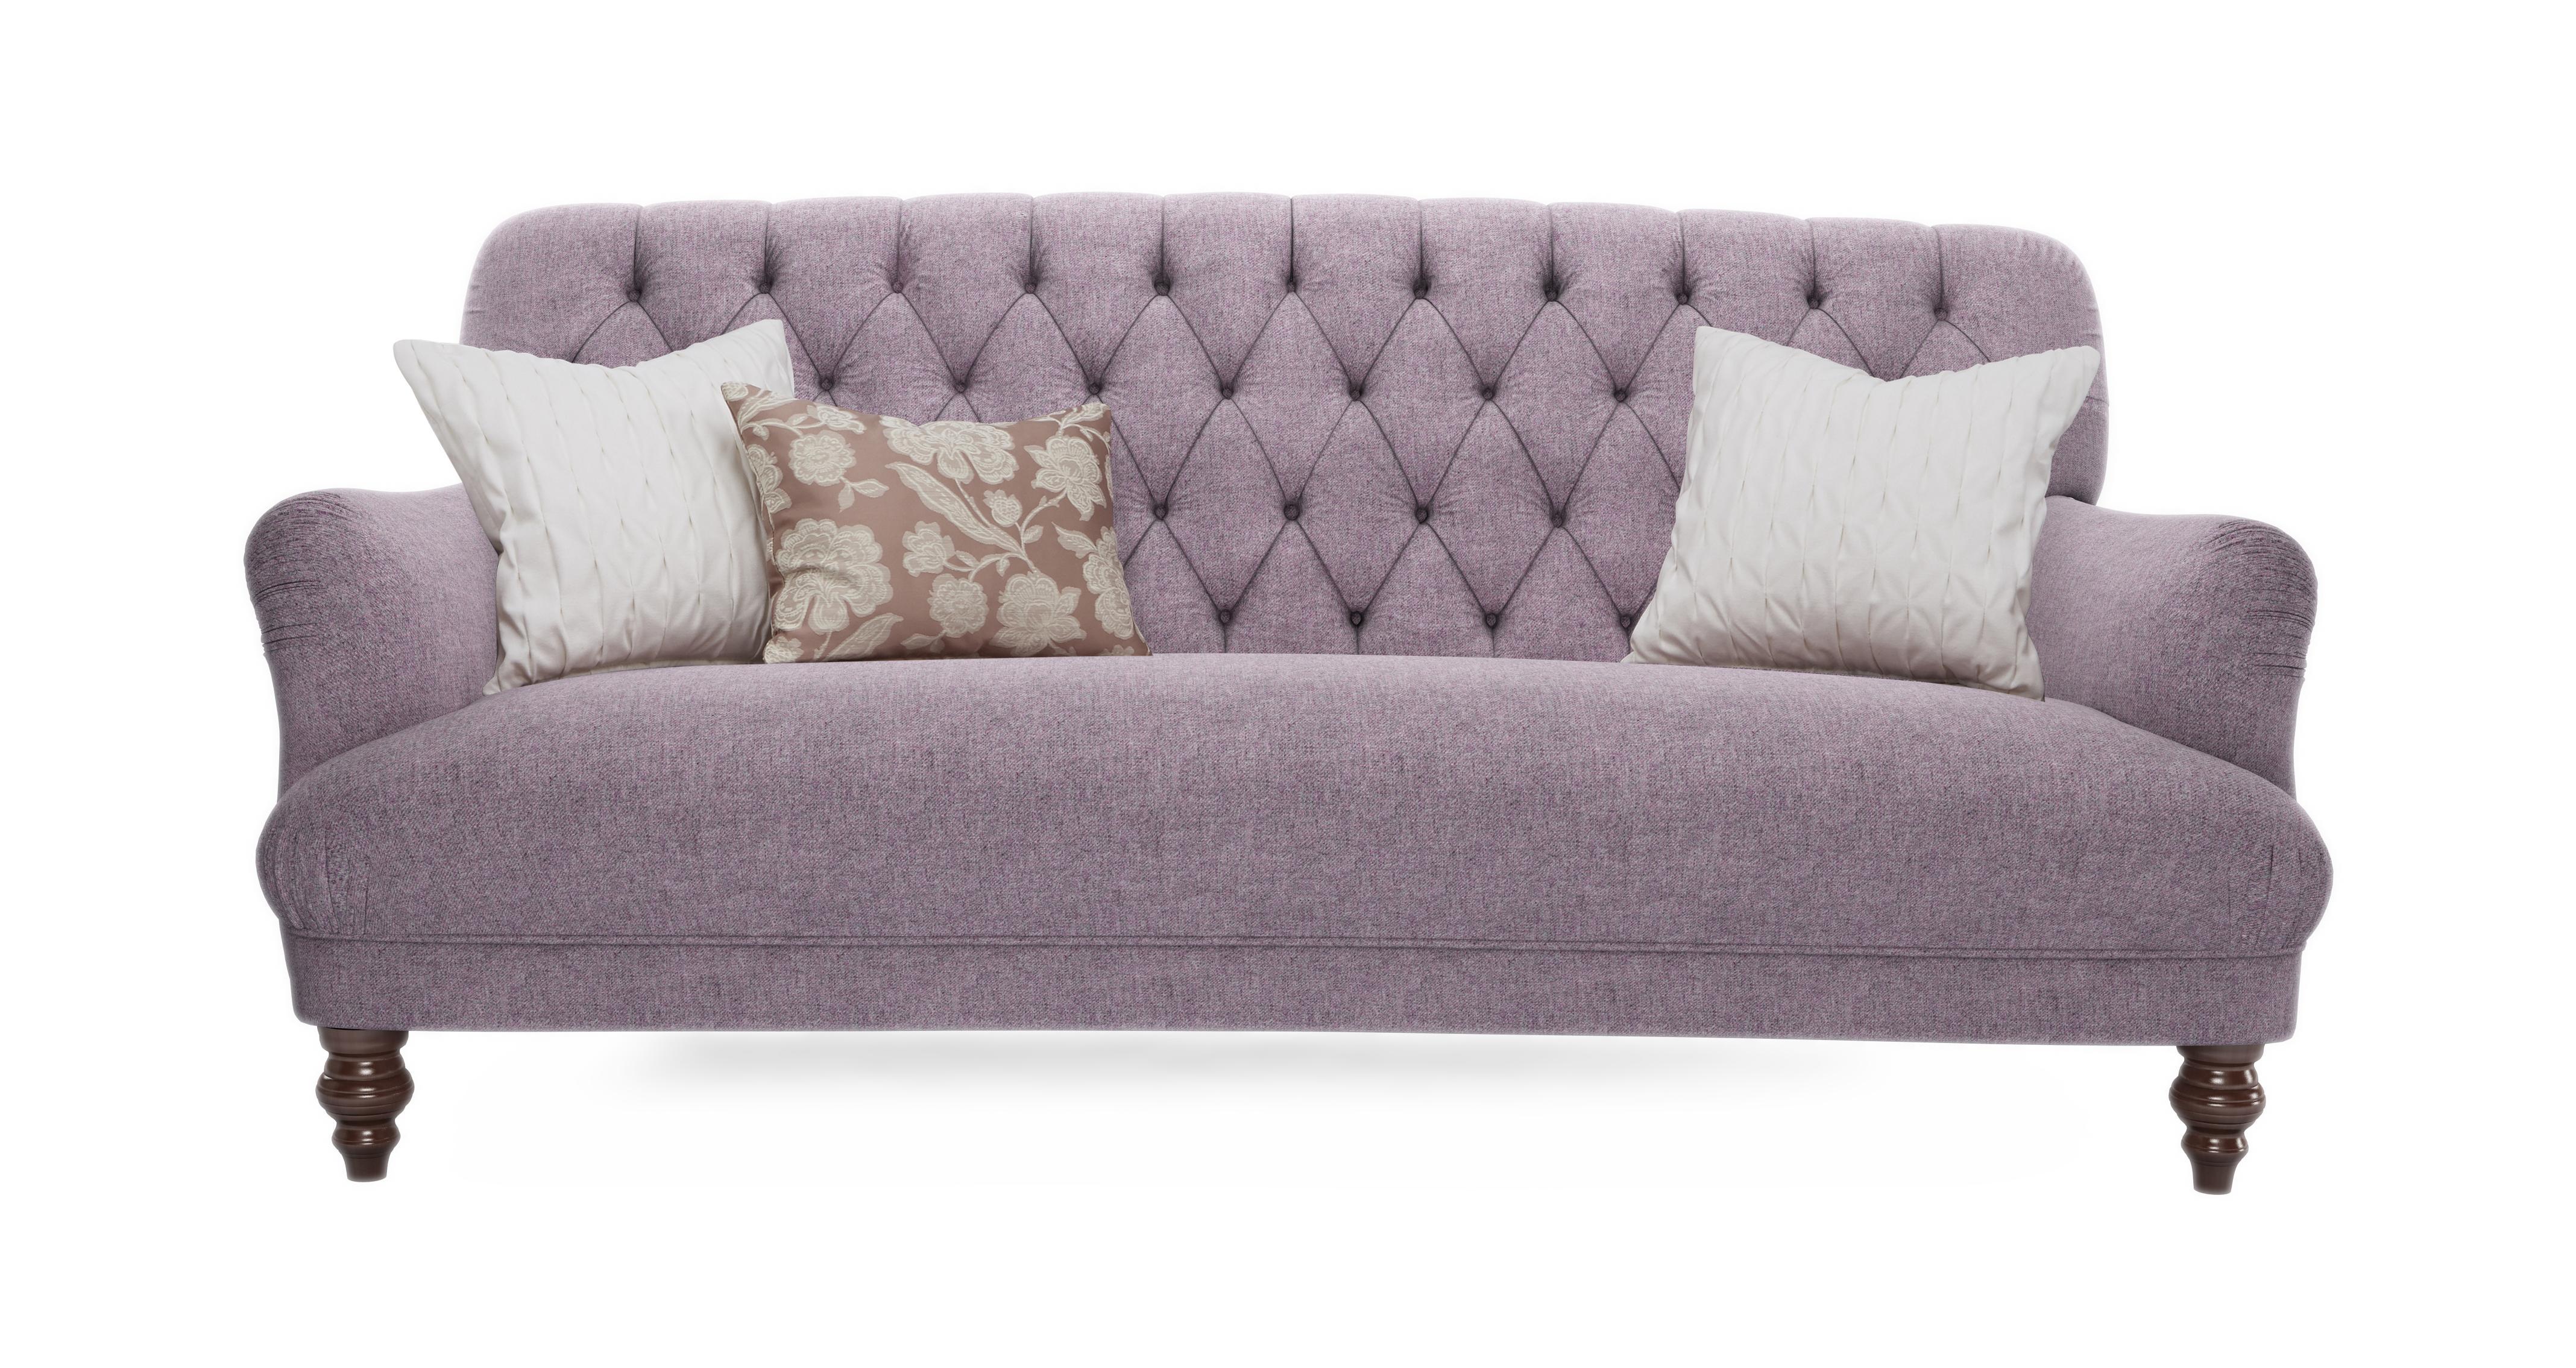 lavender sofa free removal sydney bailey wool maxi dfs